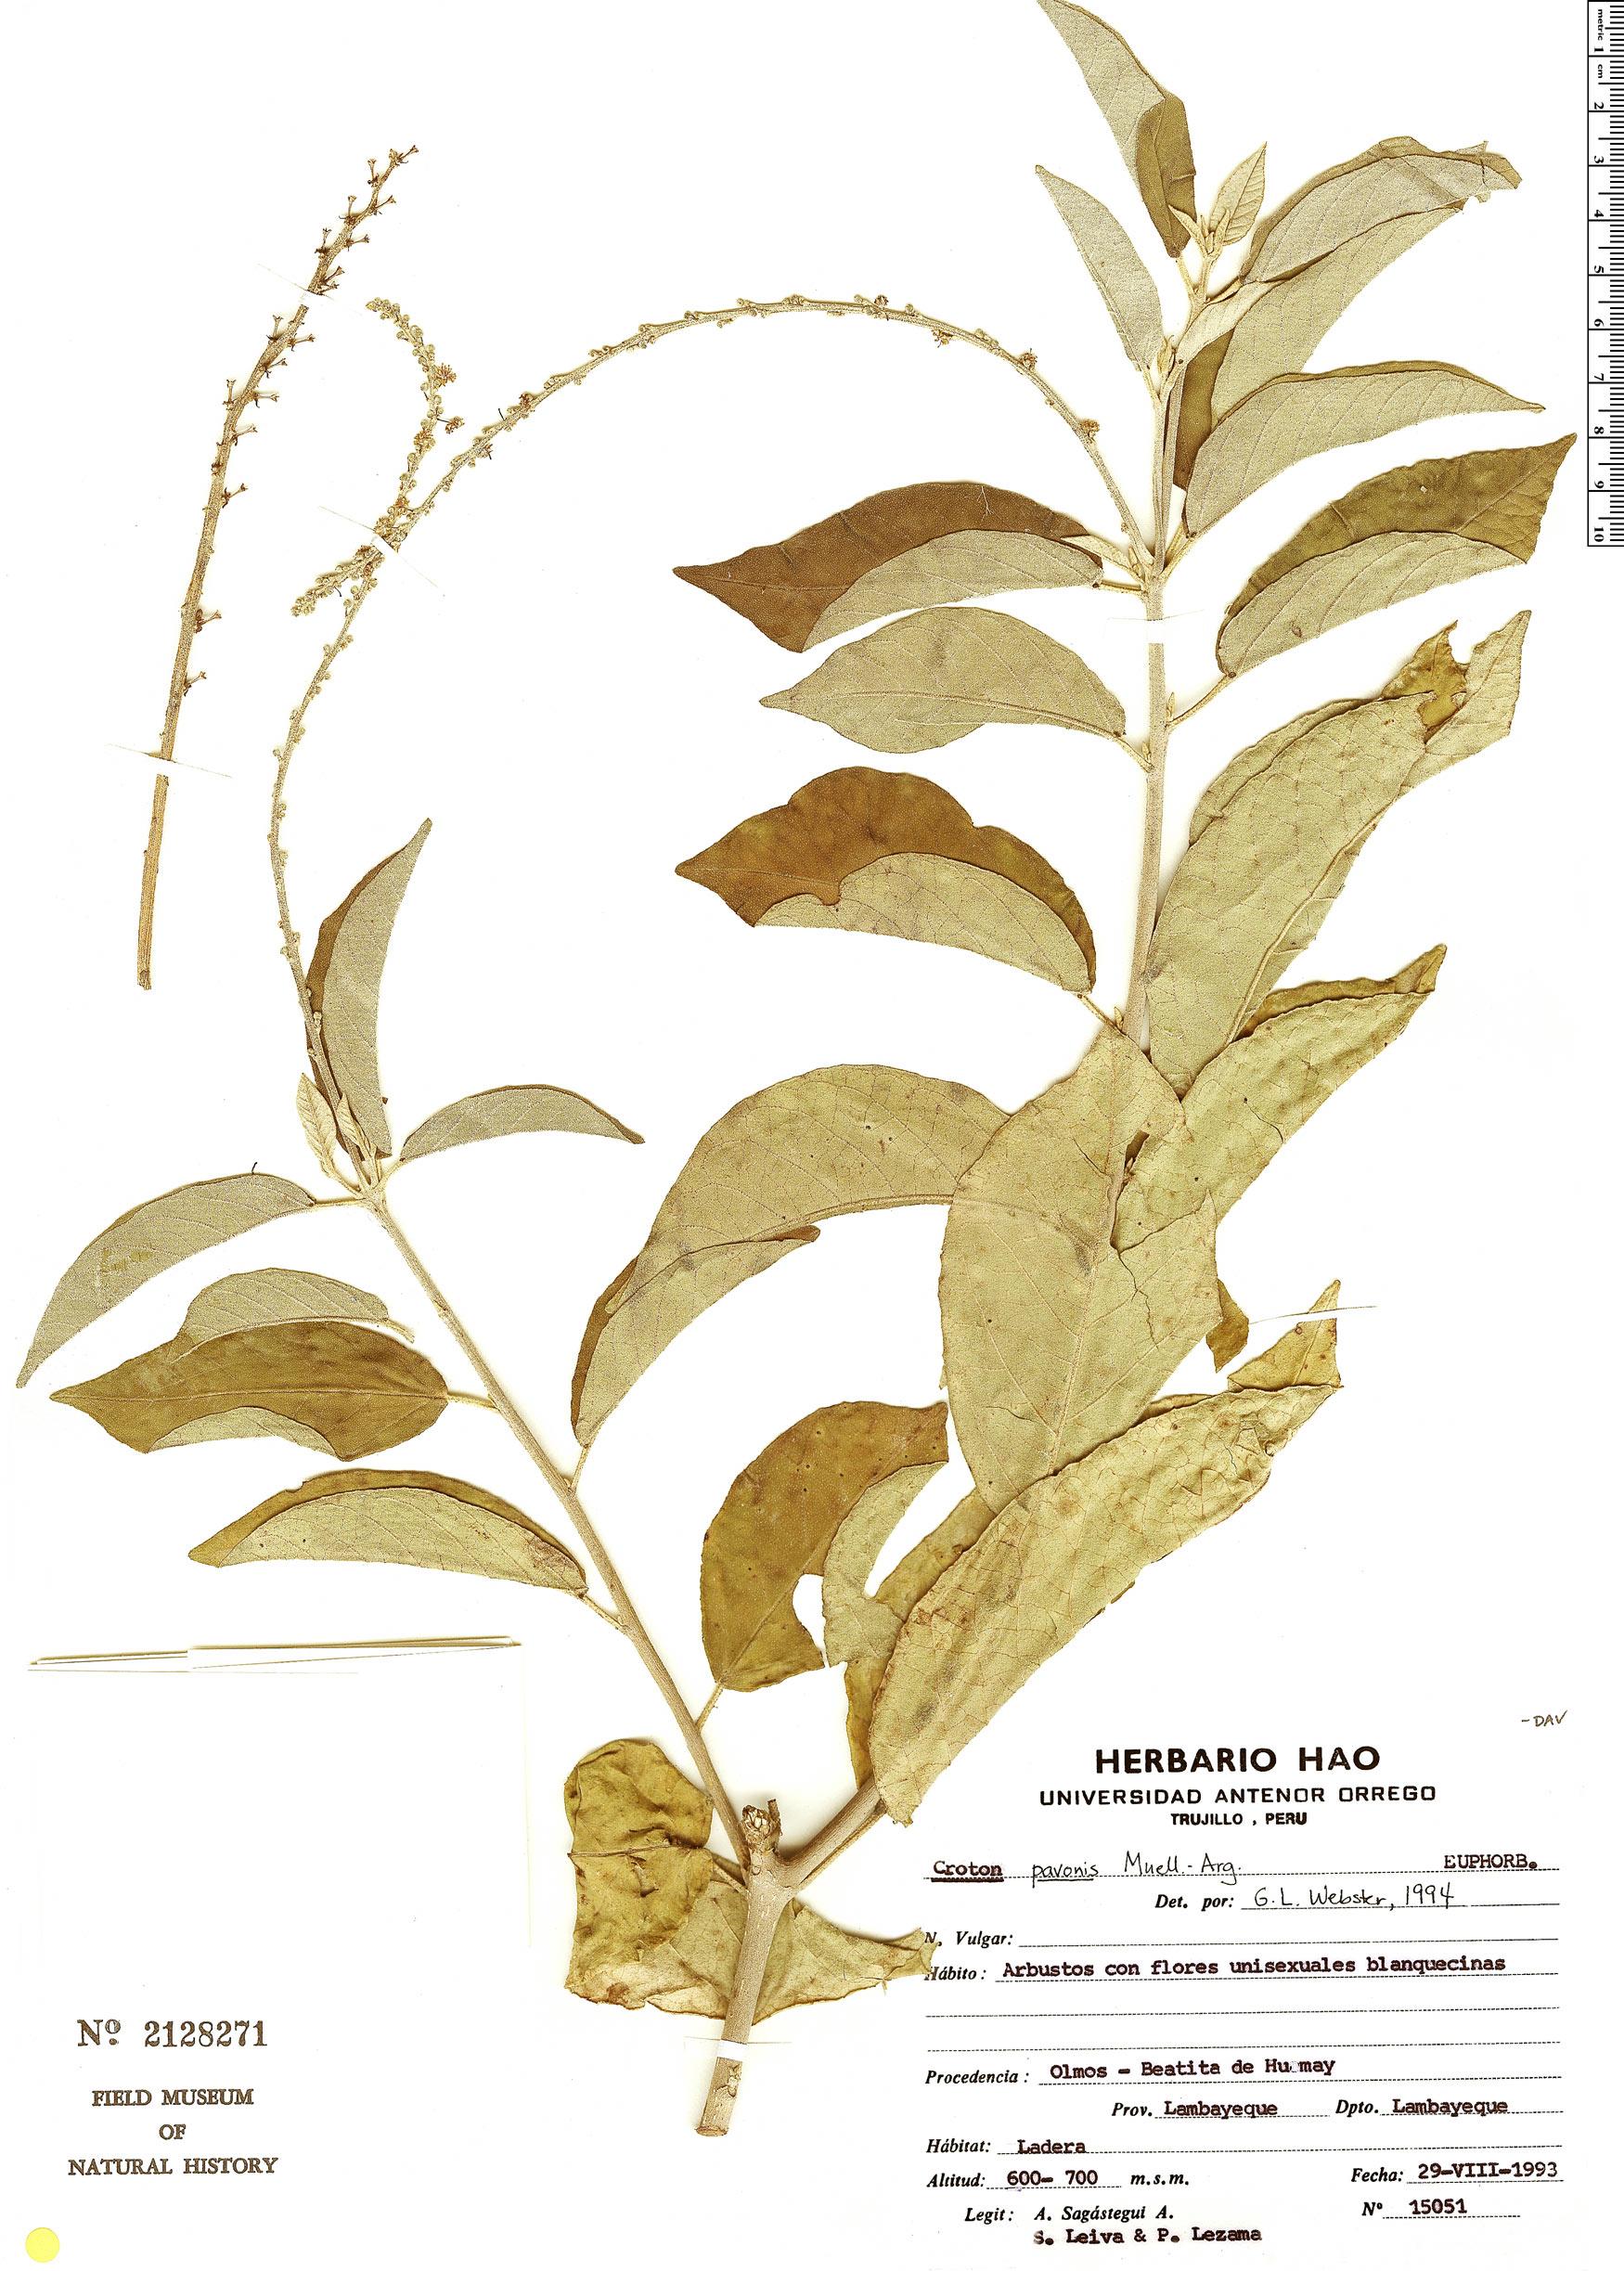 Specimen: Croton pavonis